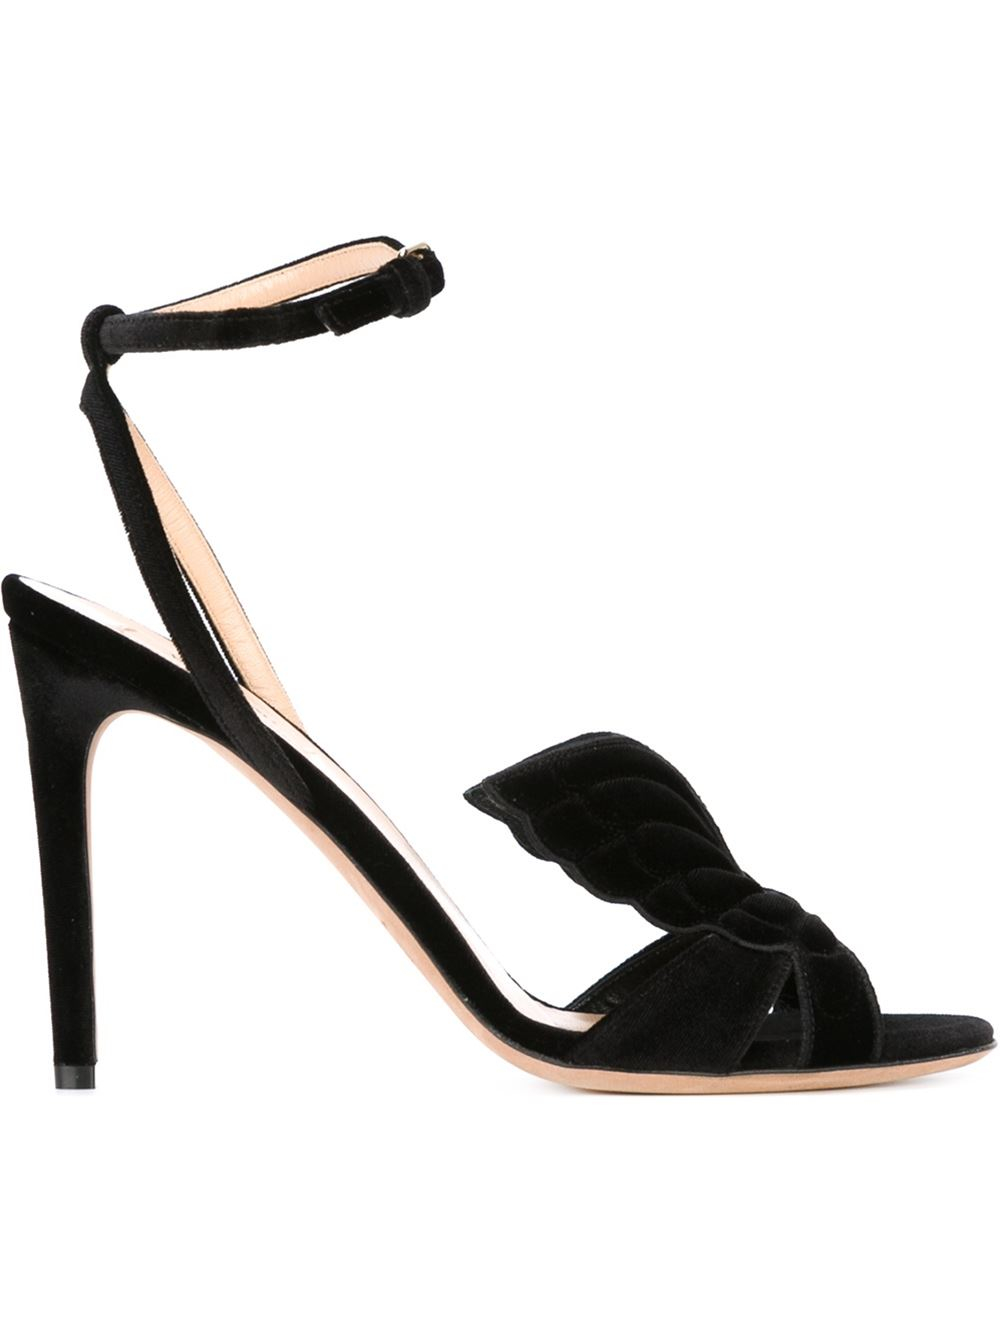 Valentino Black Suede Cruel Sandals